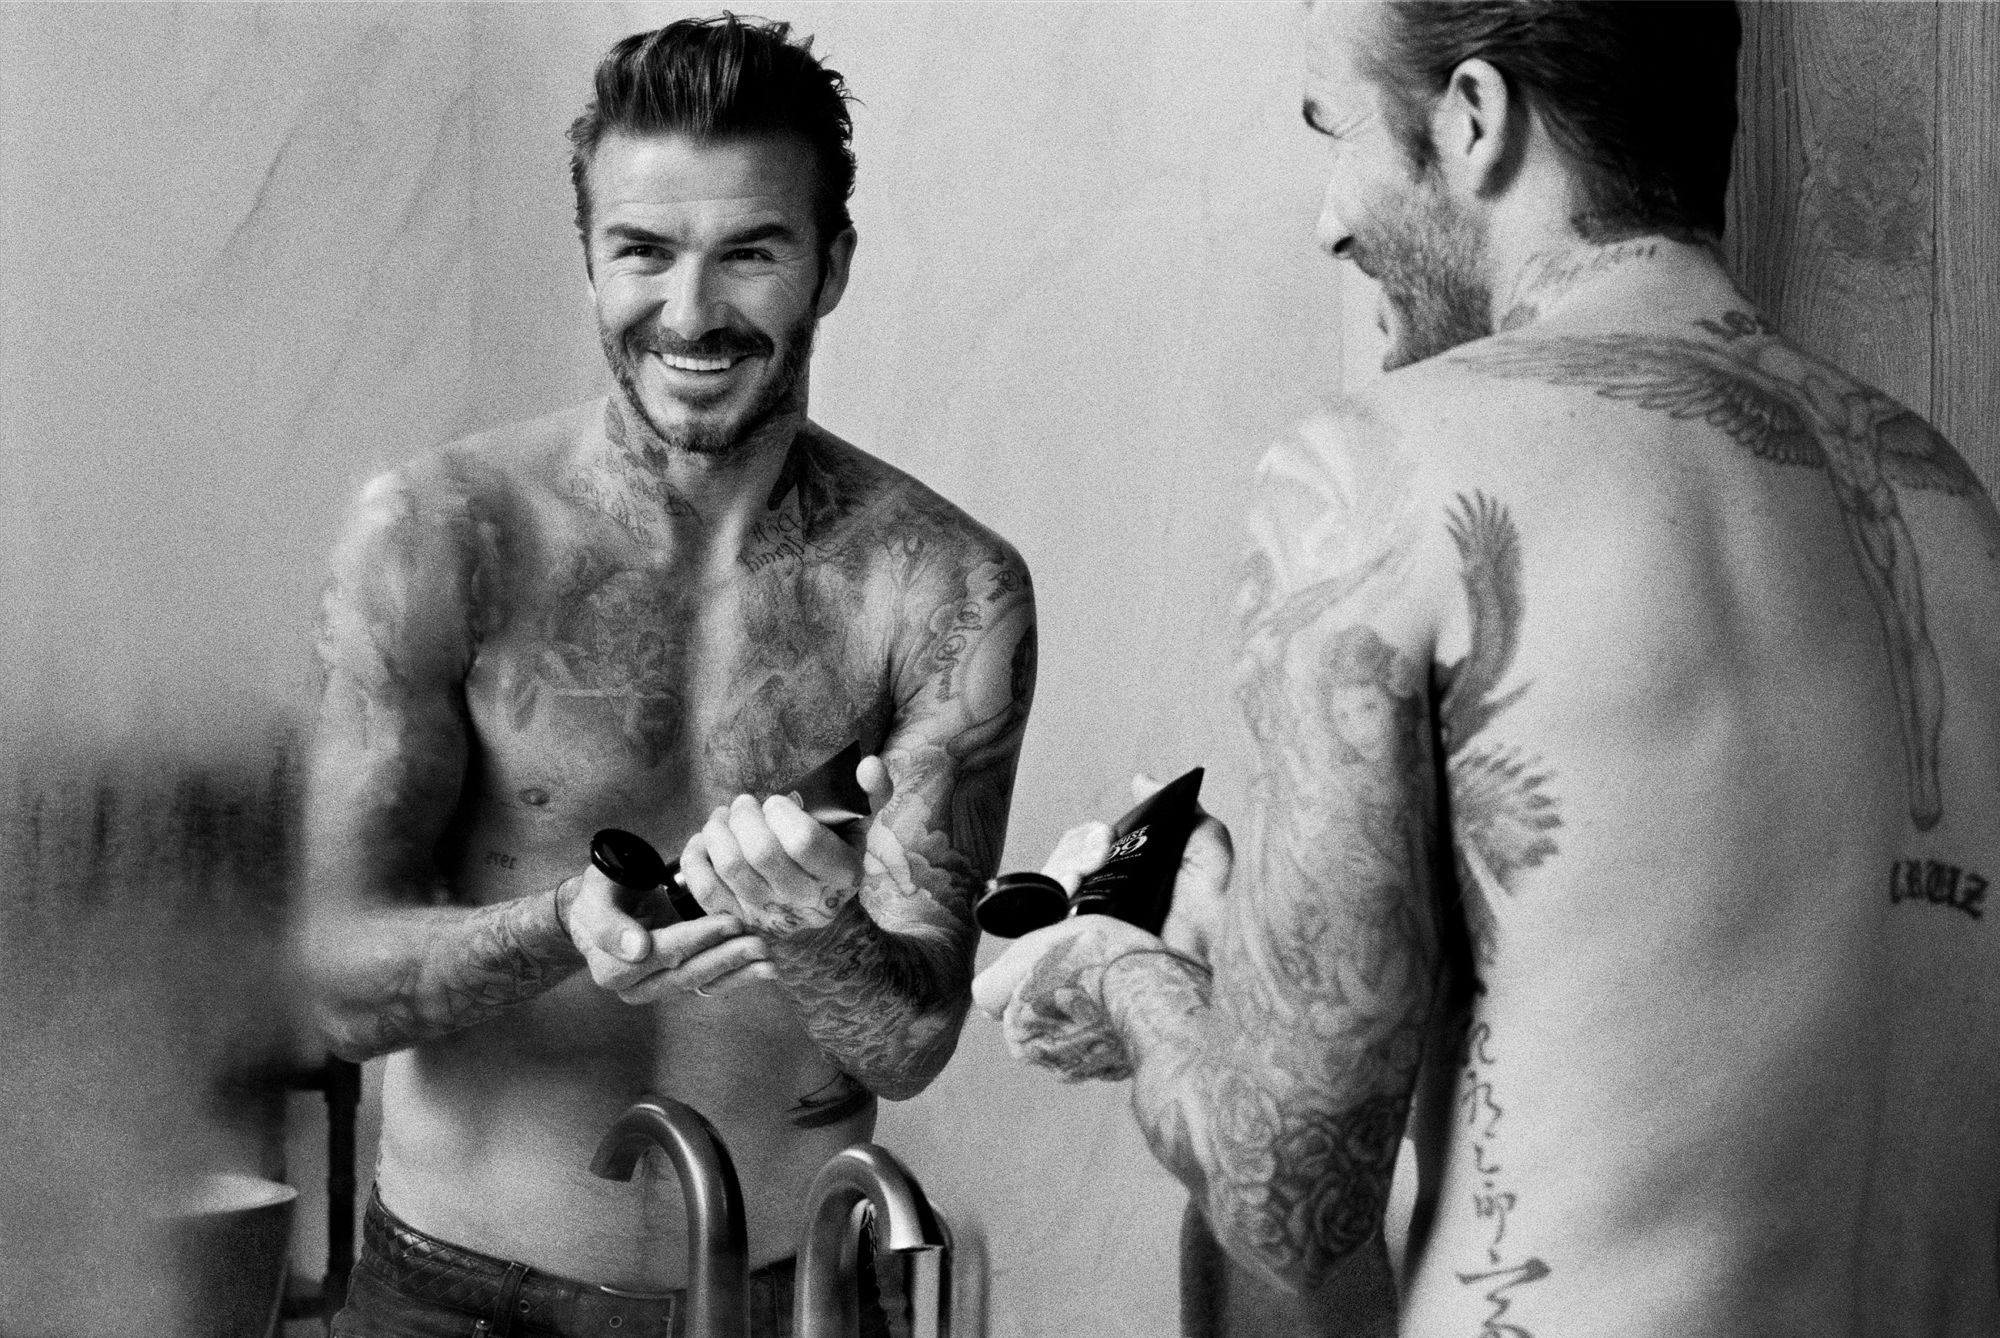 David Beckham launches debut men's grooming brand